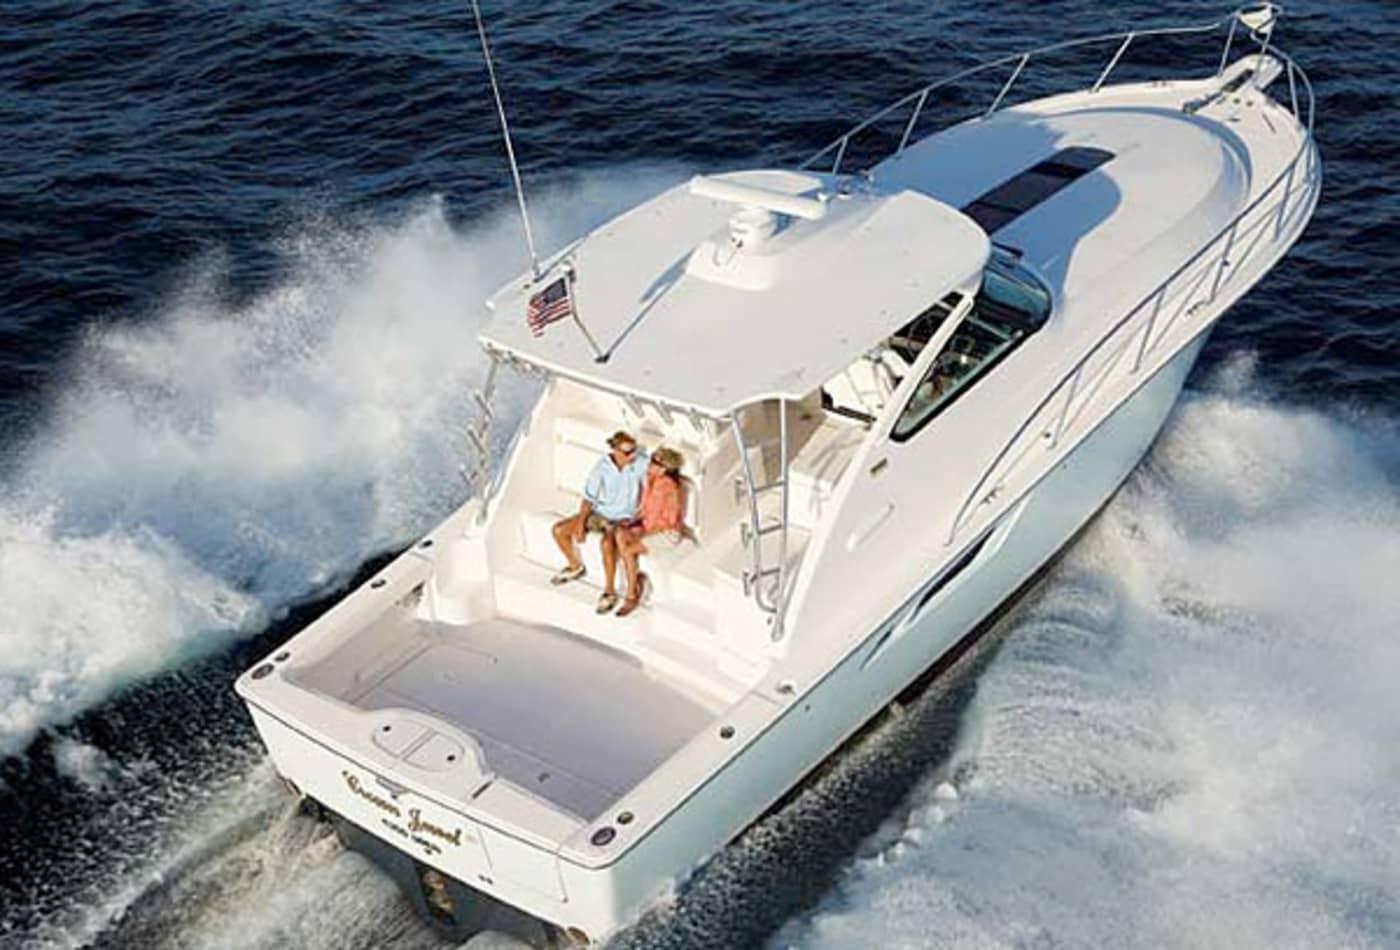 Scenes-from-2012-boat-show-tiara4300.jpg